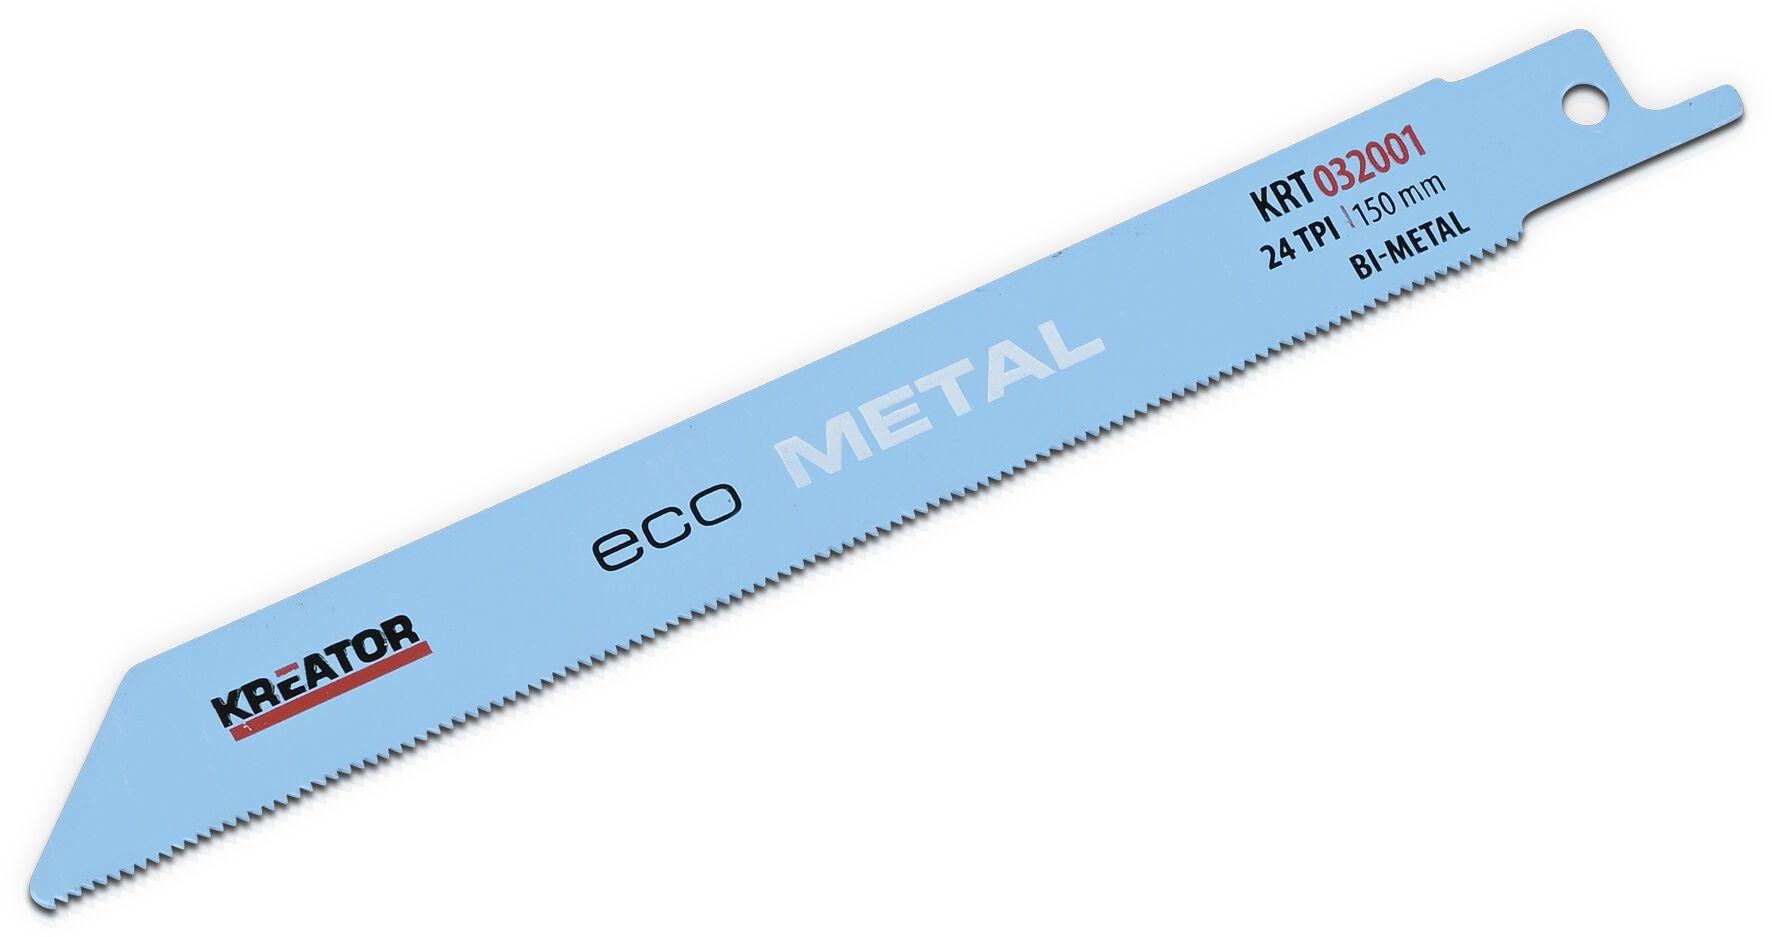 Kreator KRT032001 150mm Reciprozaagbladen   Zaagblad reciprozaag   Voor aluminium